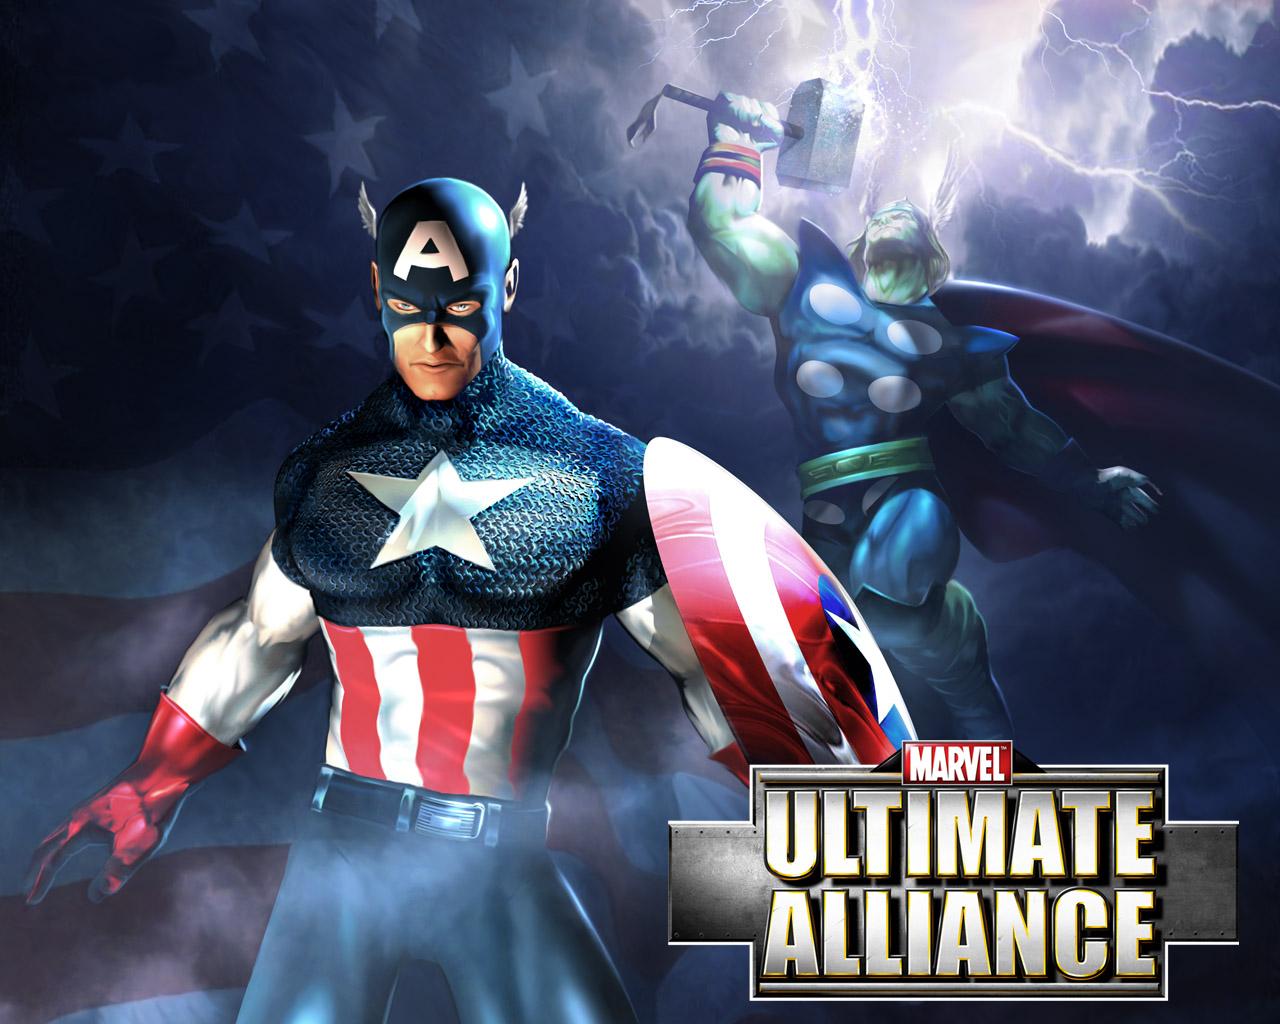 60 Superb Superhero Wallpapers TechWorthy 1280x1024